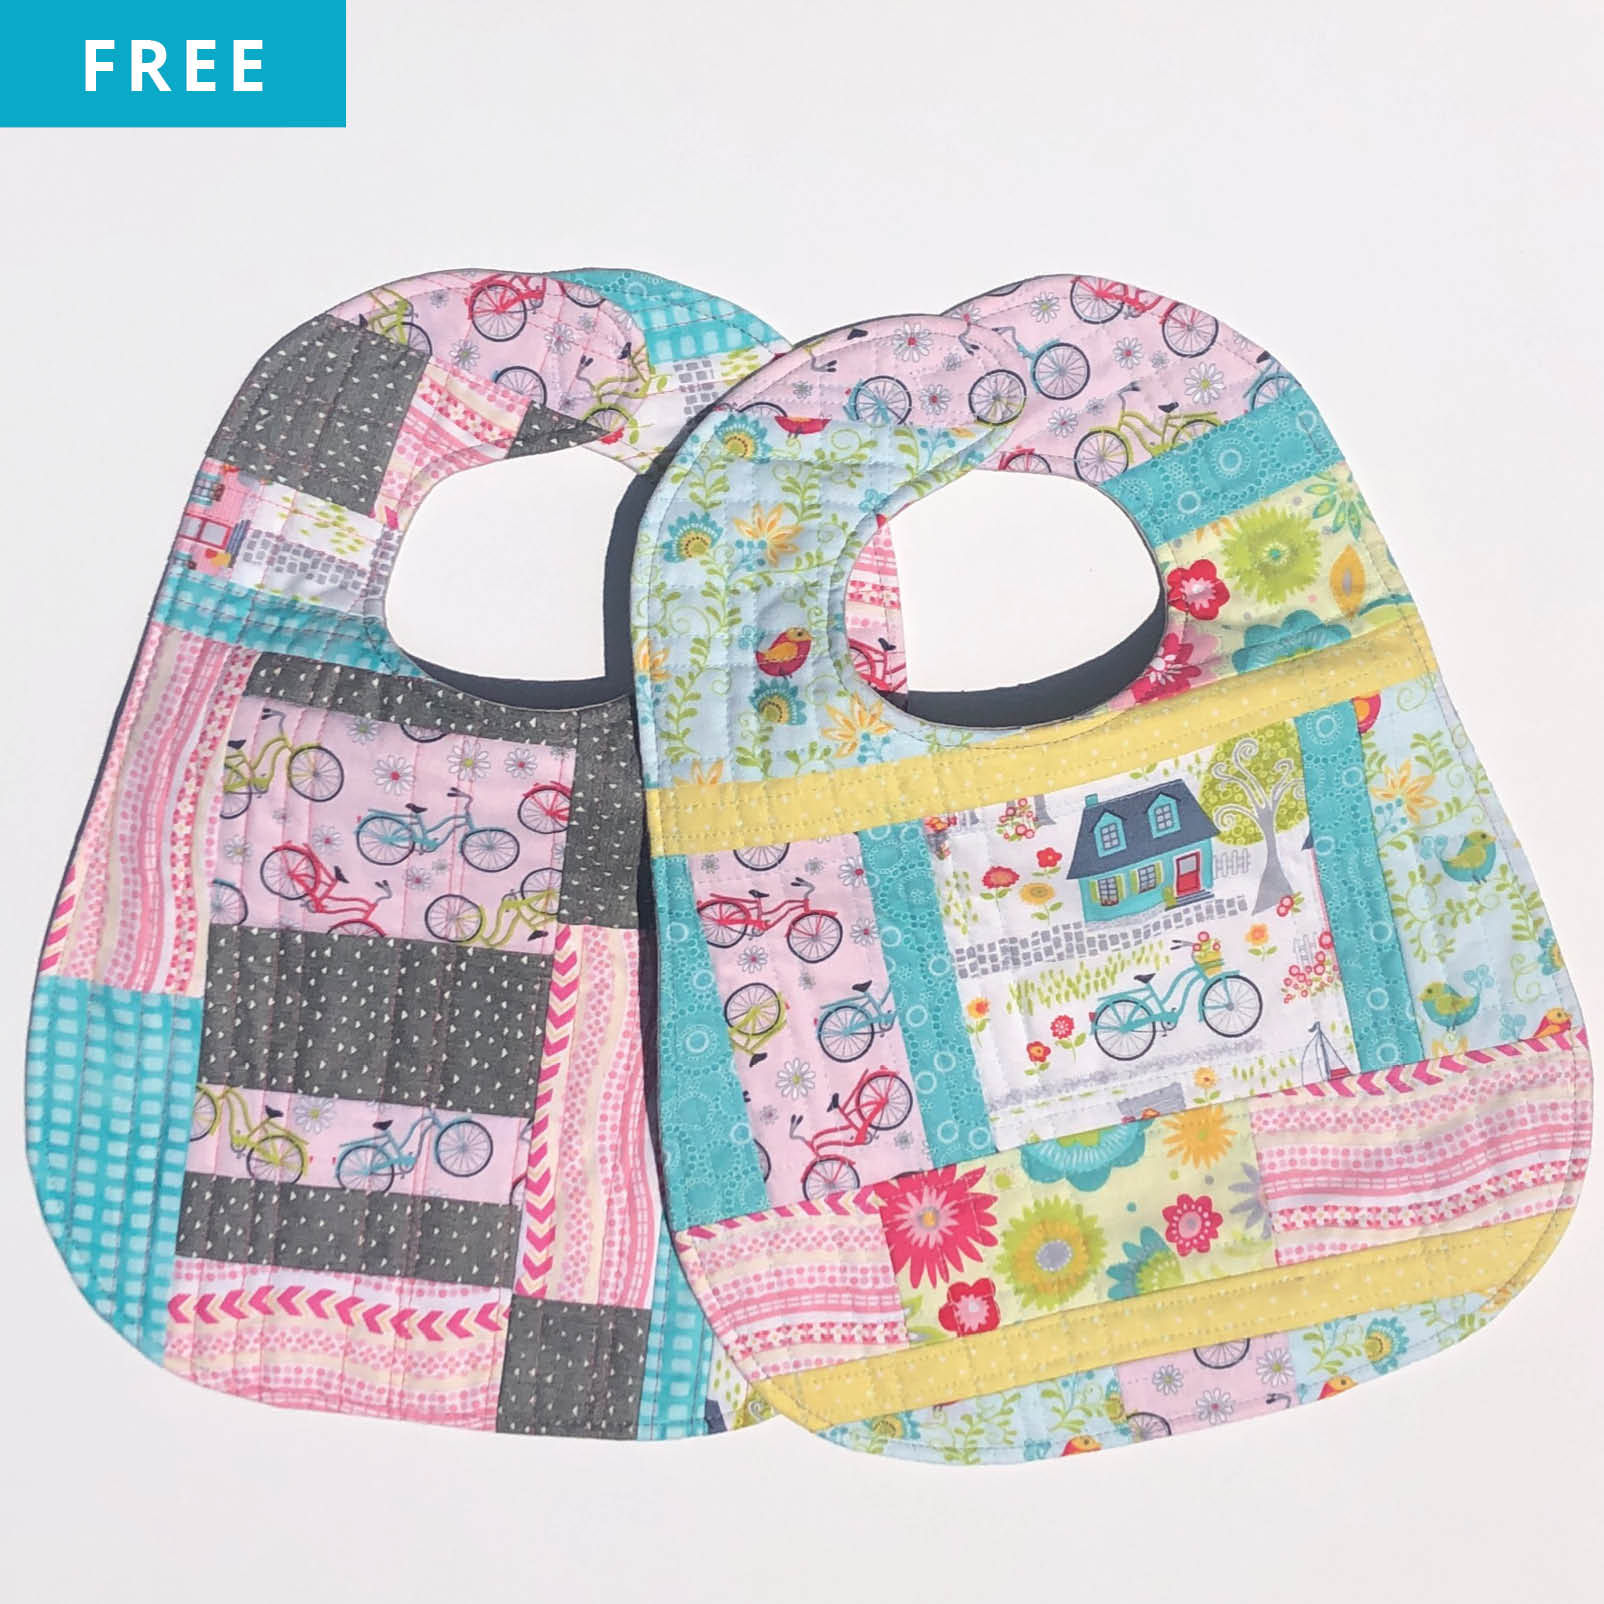 Free Quilt Pattern - Bib Building 101 - QAYG Method